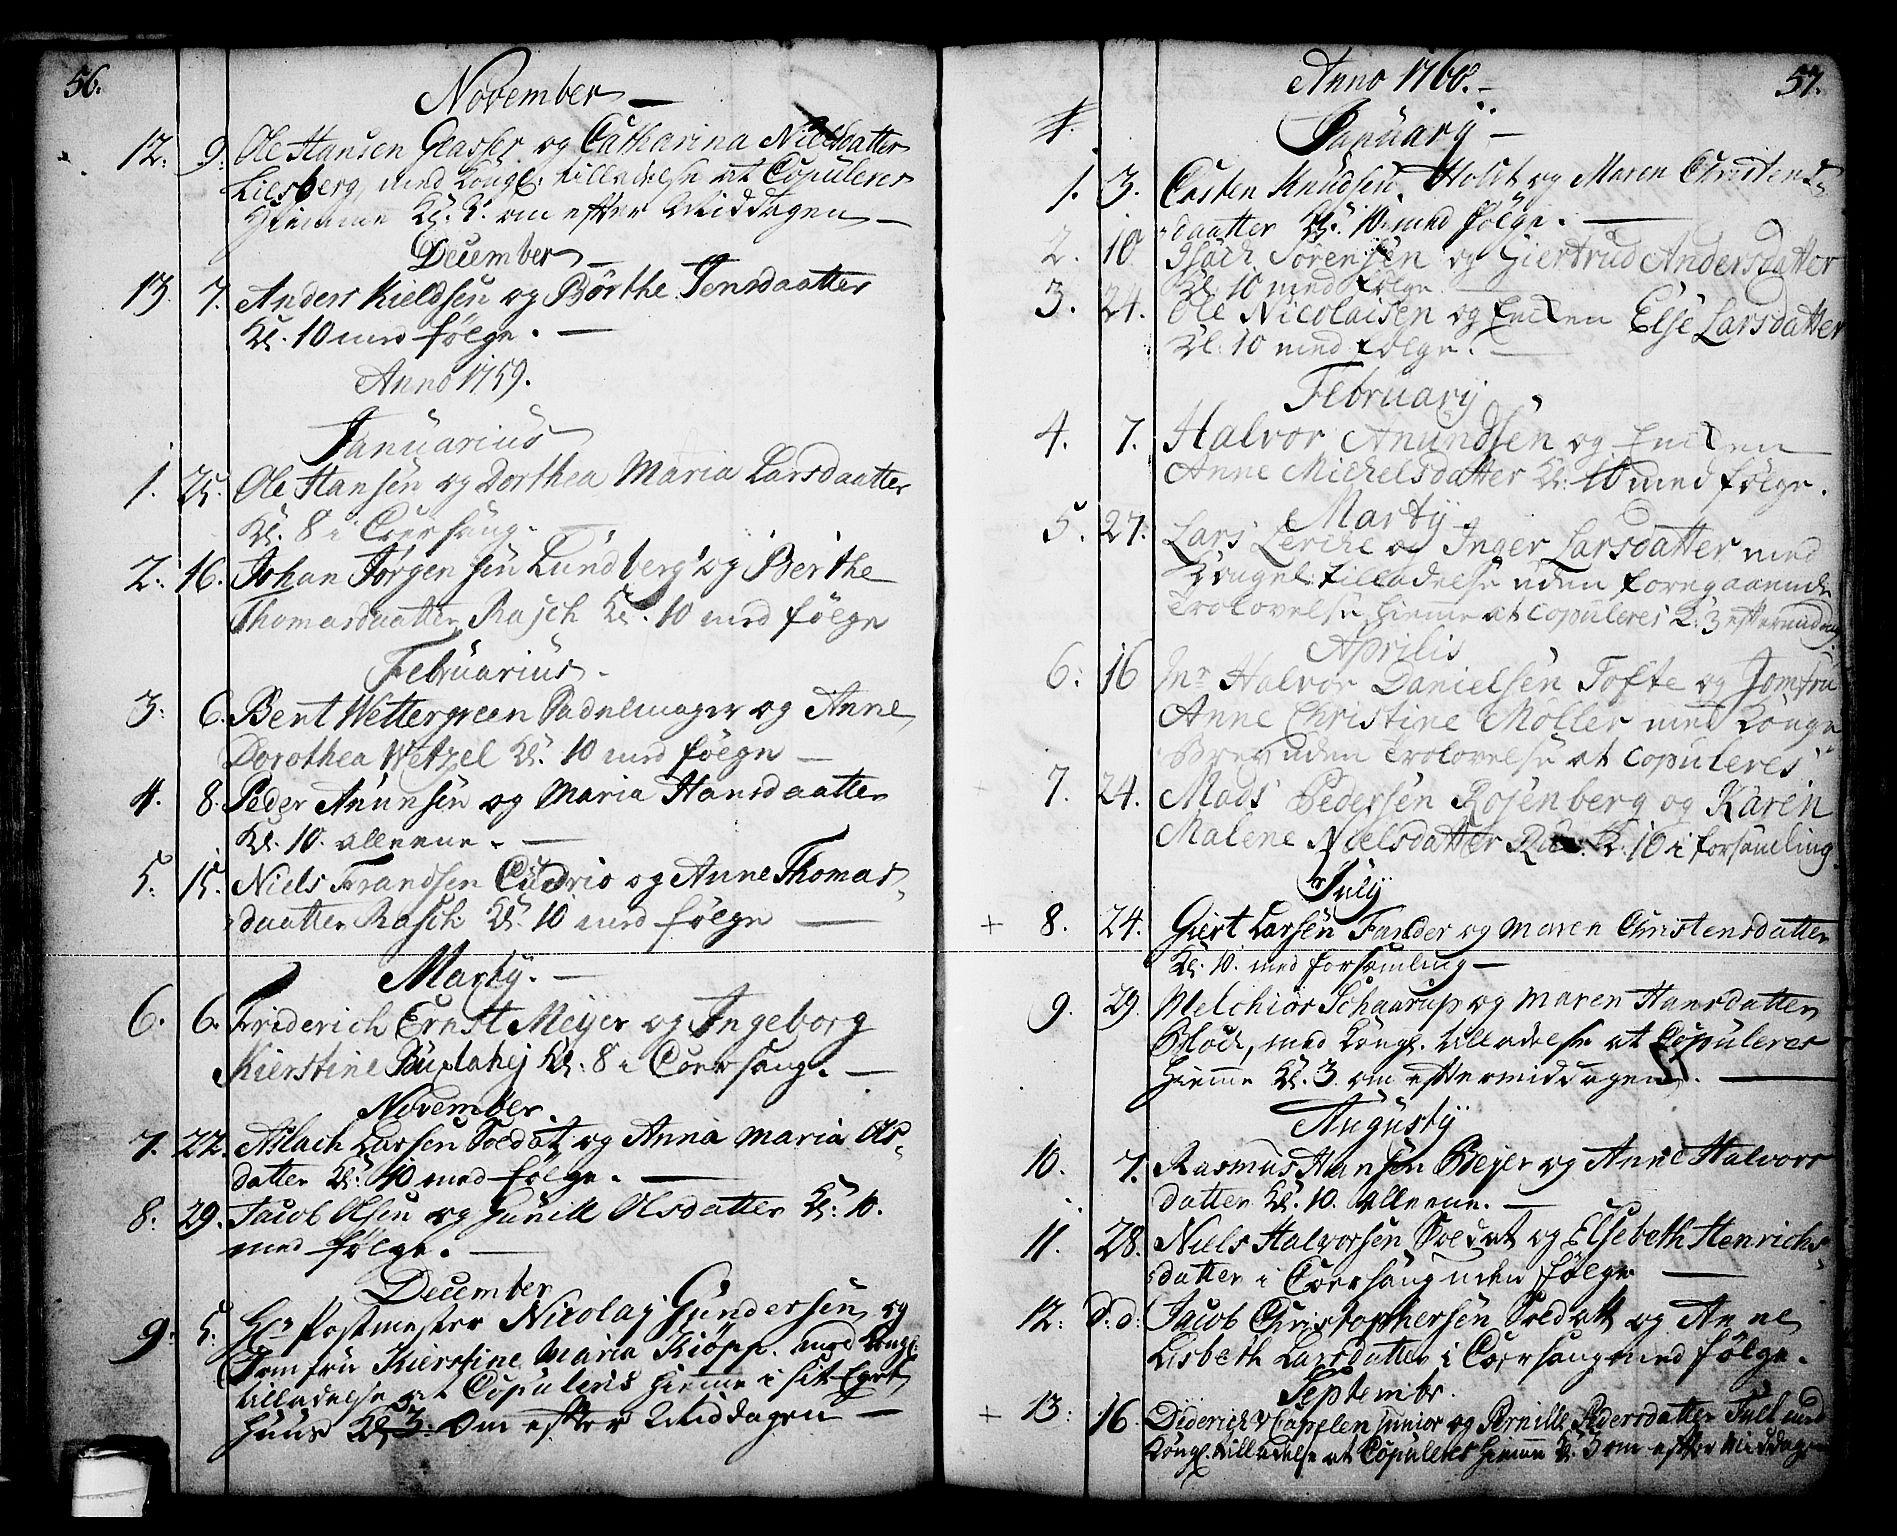 SAKO, Skien kirkebøker, F/Fa/L0003: Parish register (official) no. 3, 1755-1791, p. 56-57